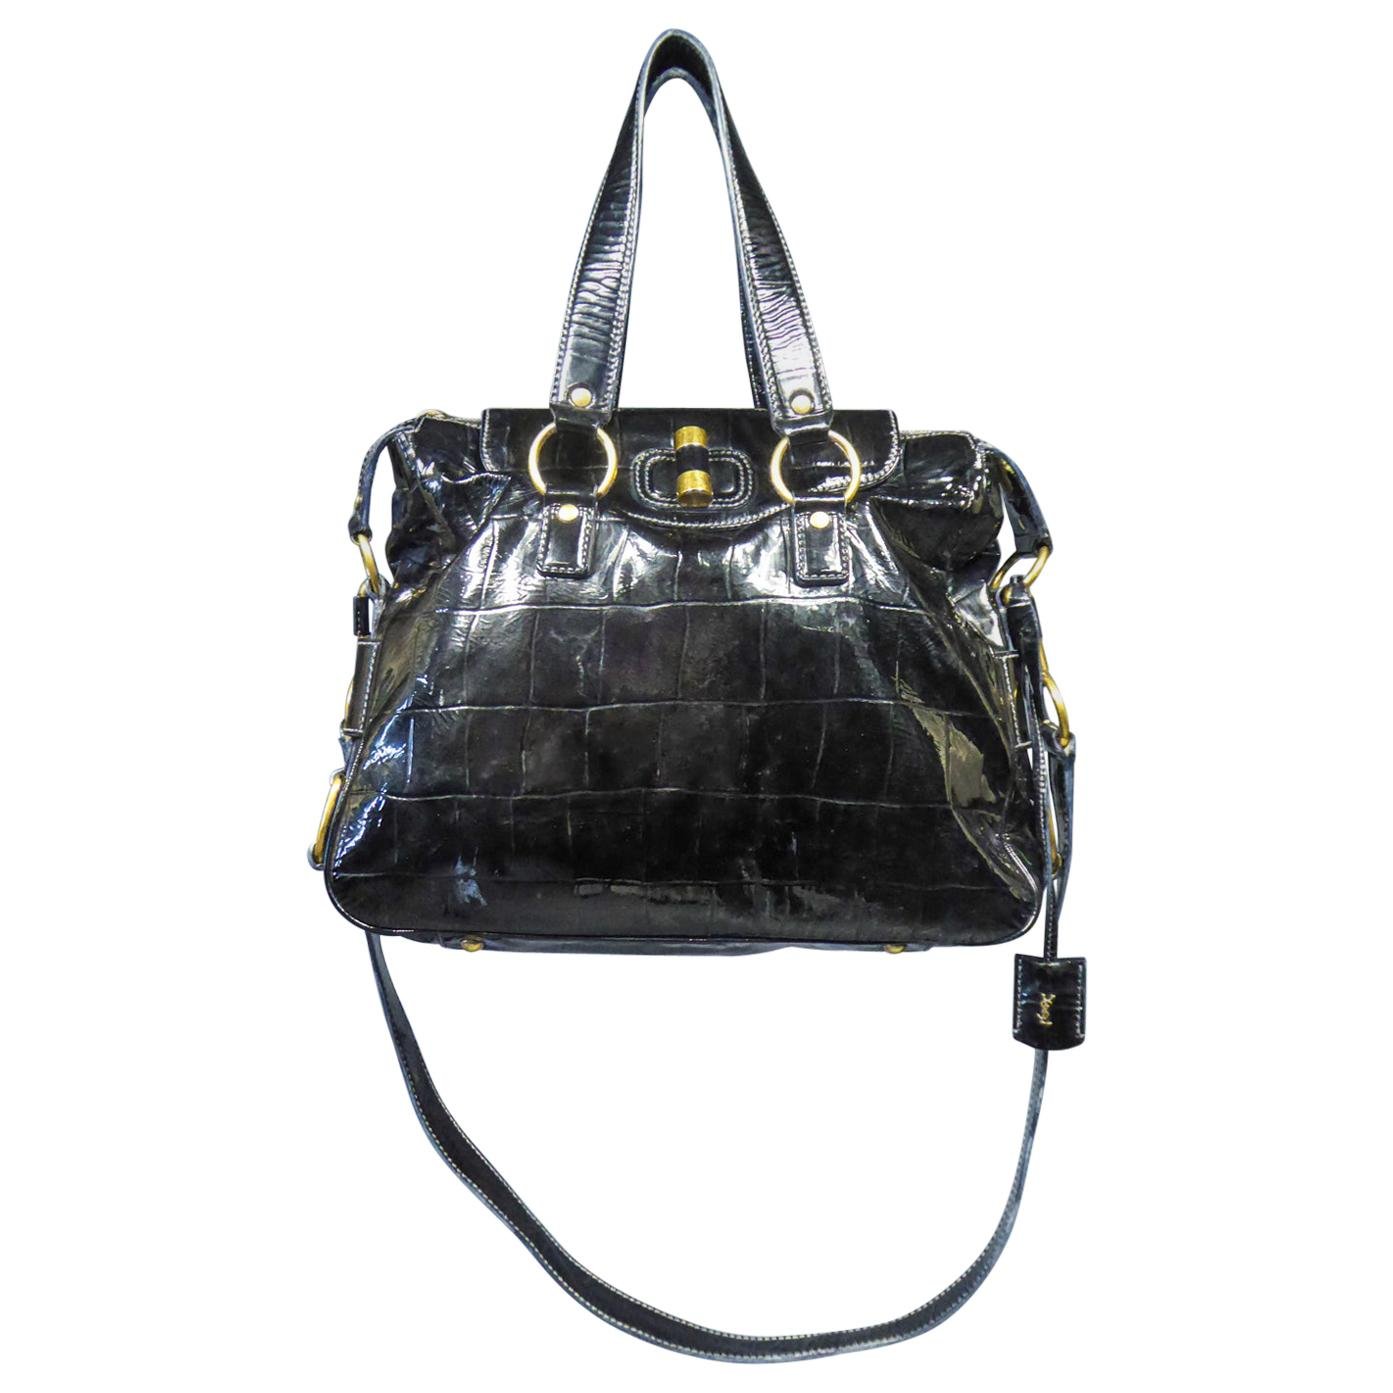 An Yves Saint Laurent Rive Gauche Bag in Black Patent VinylCirca 1990